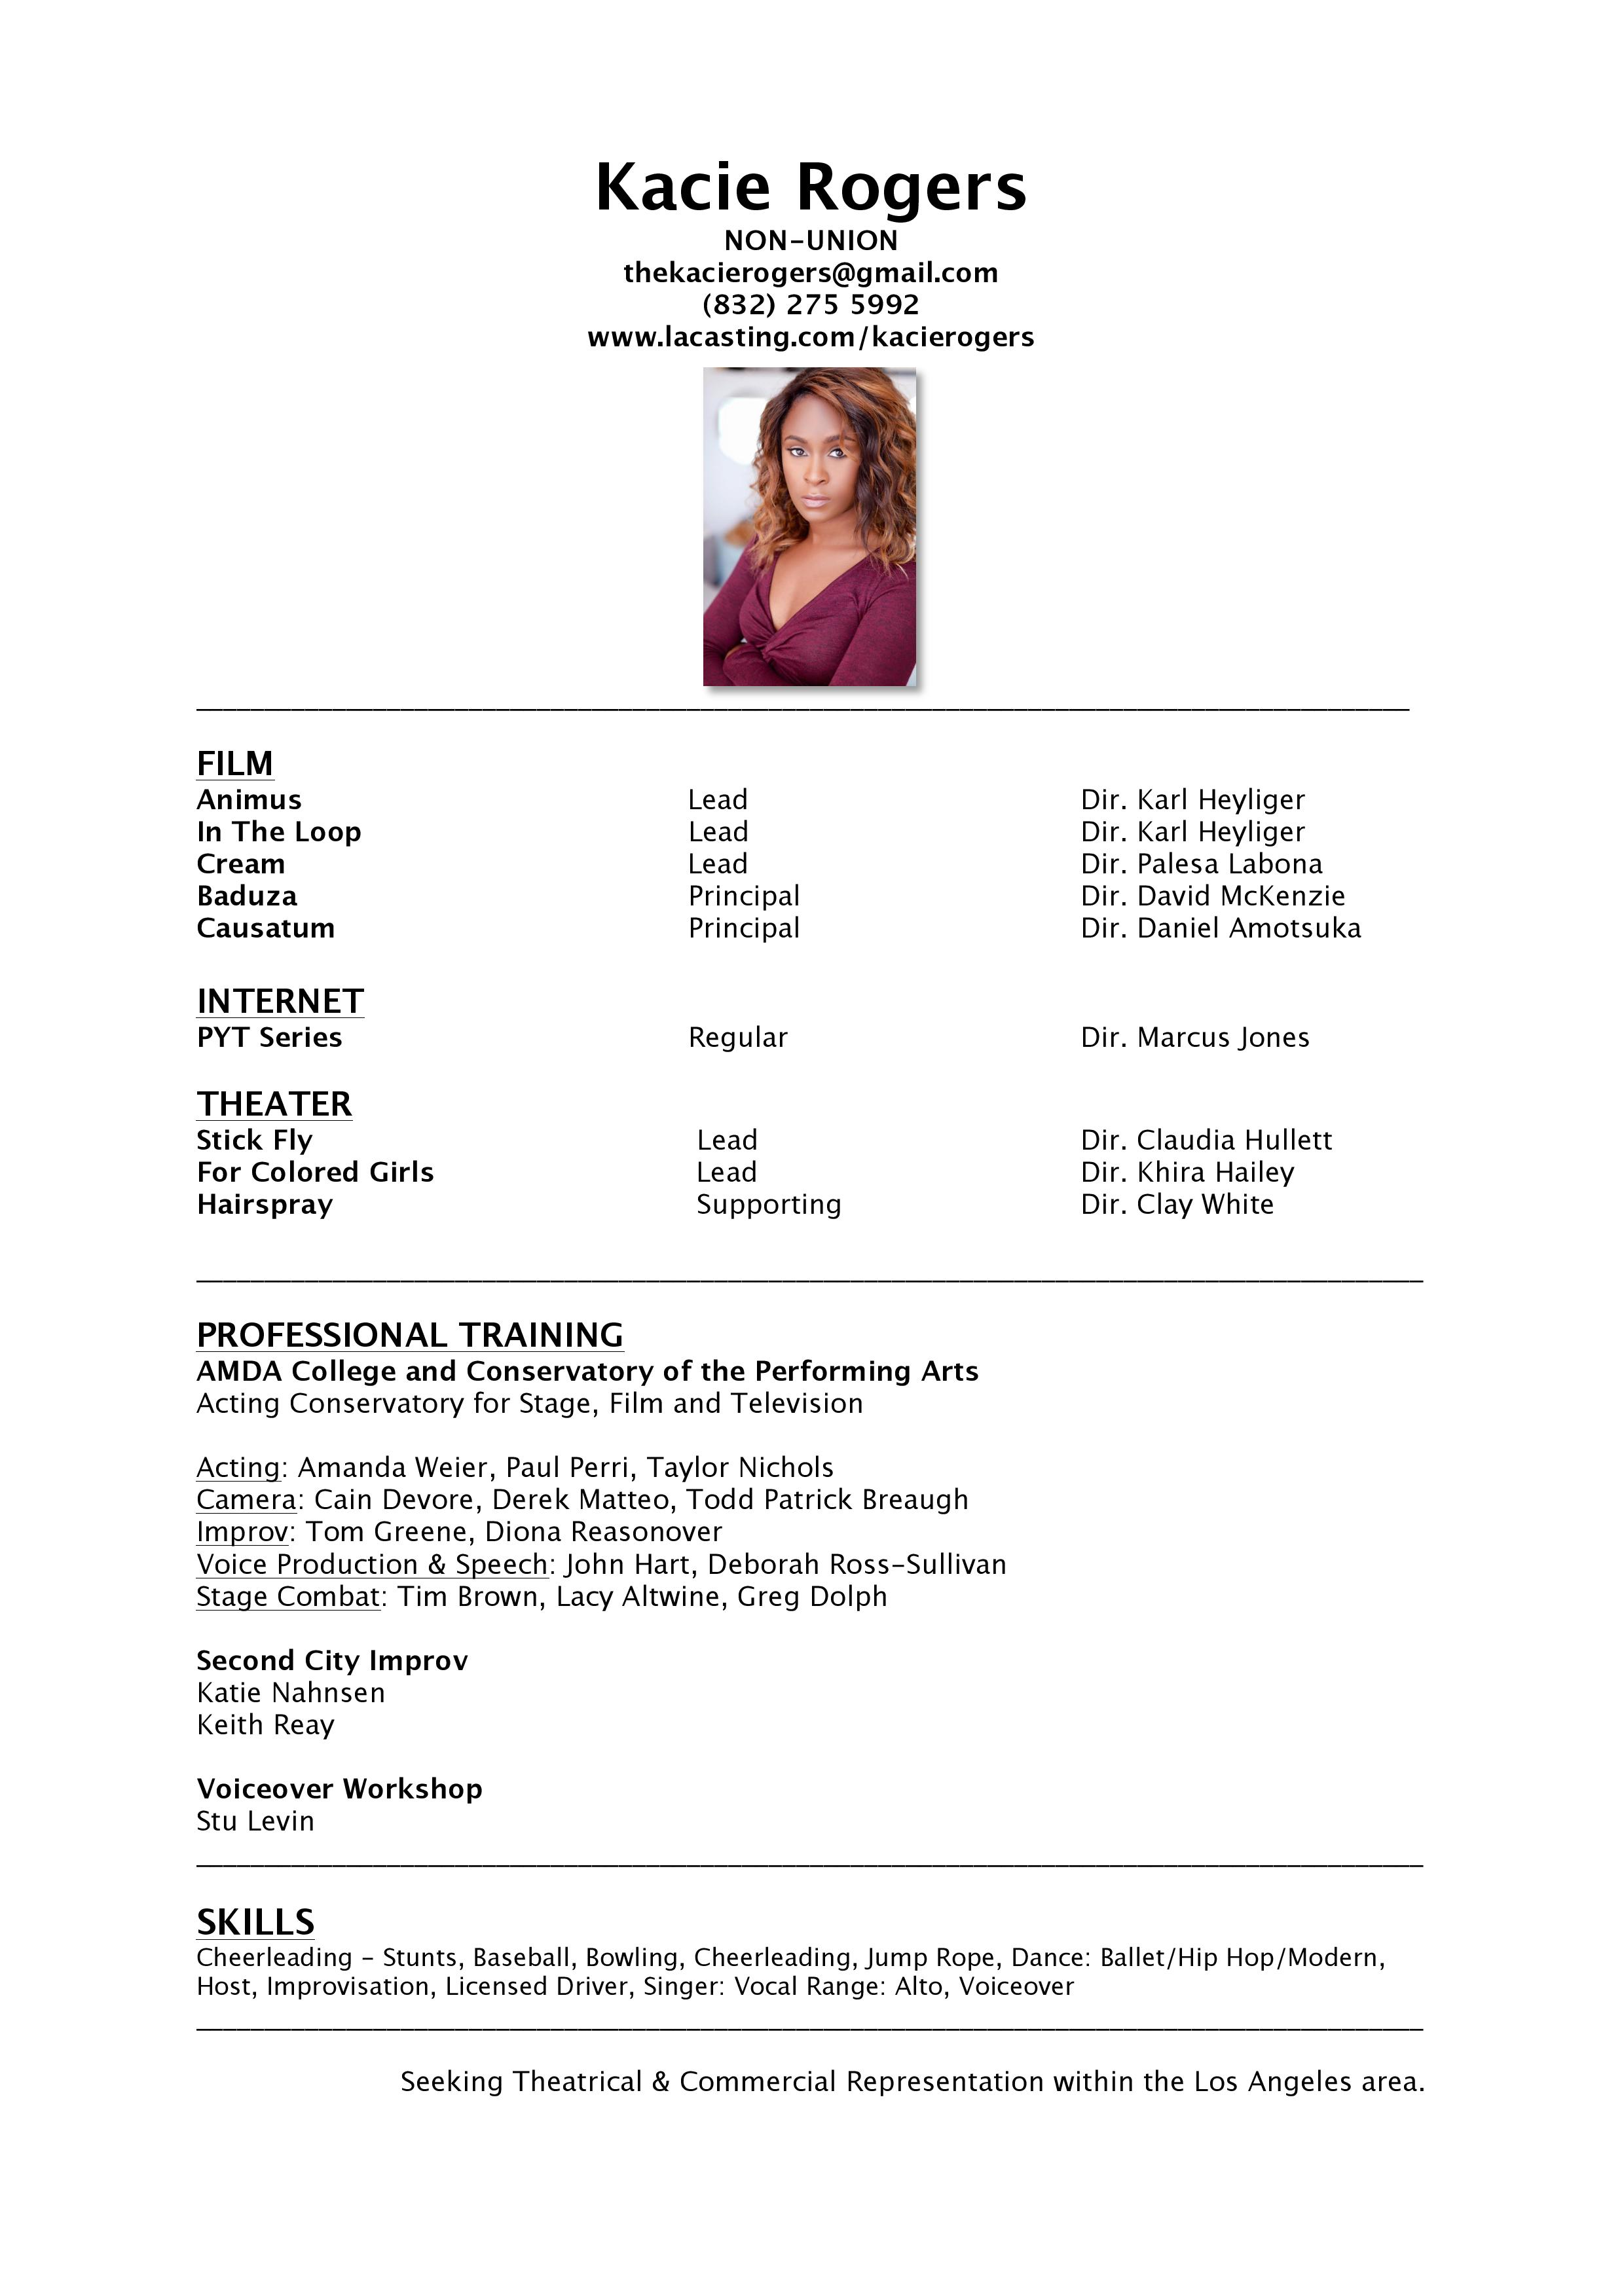 Kacie Rogers The NEW Resume Word-page-001.jpg